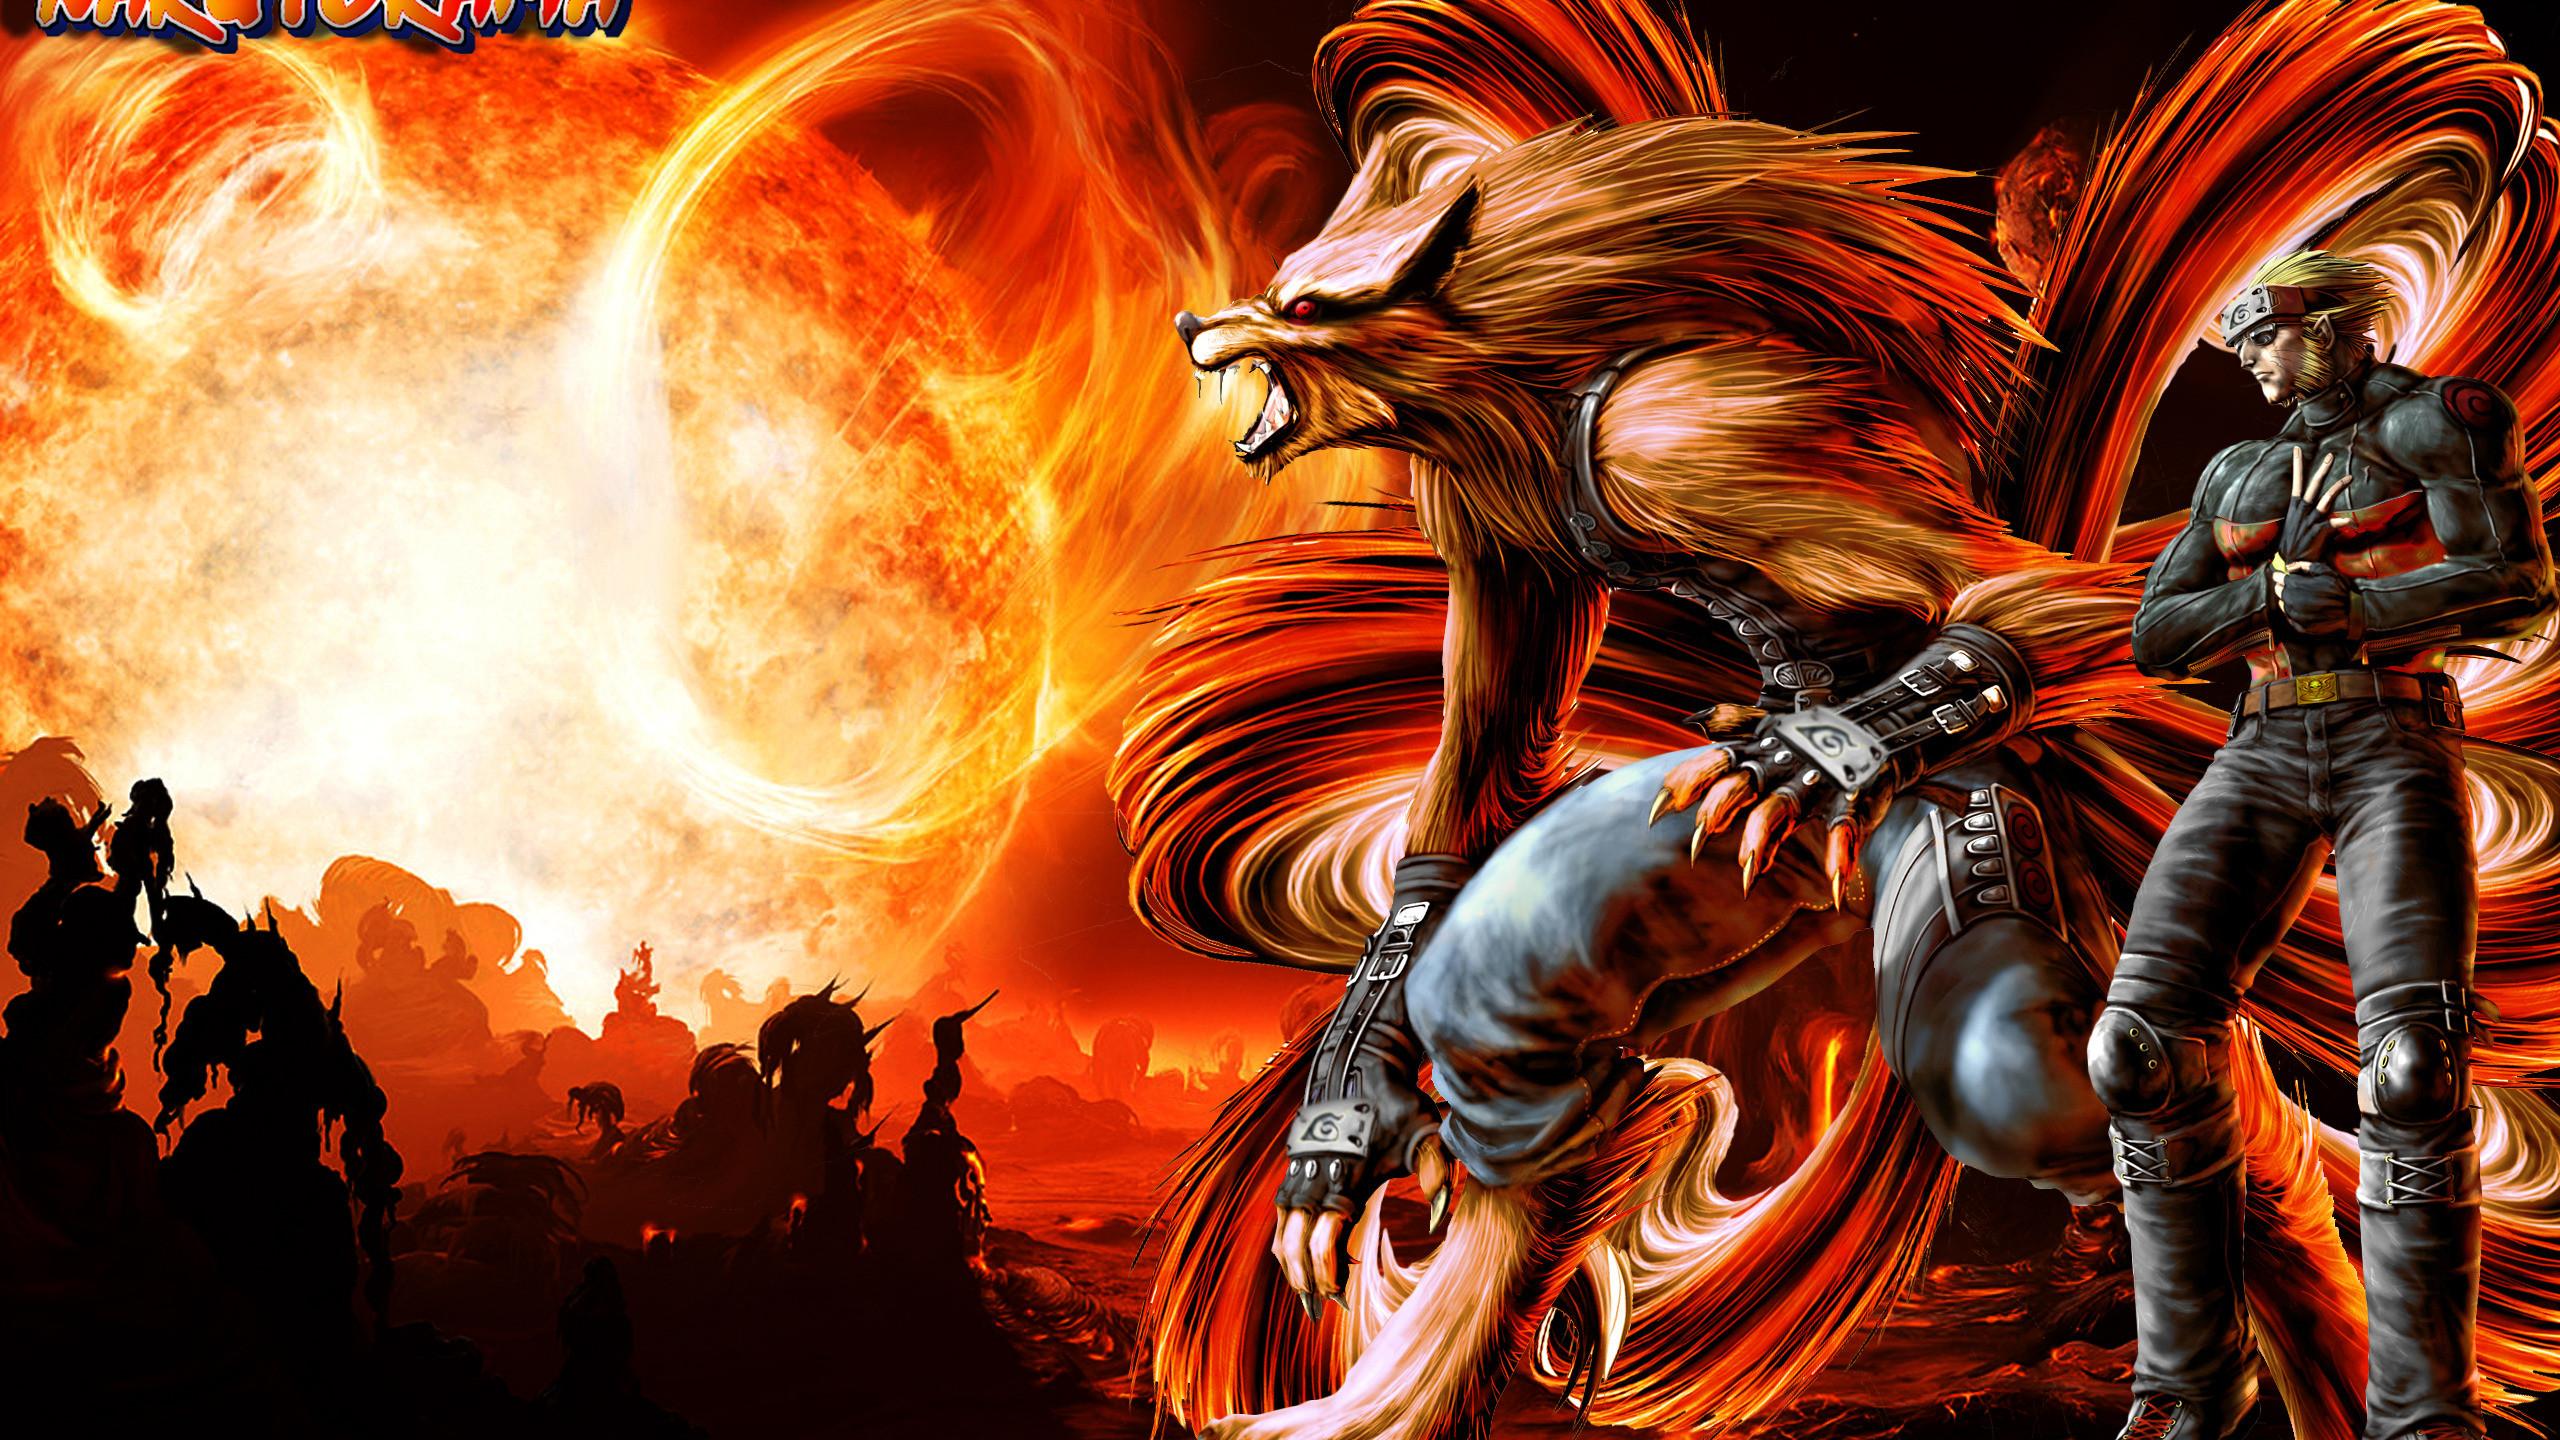 Naruto Nine Tails Wallpaper ·① WallpaperTag